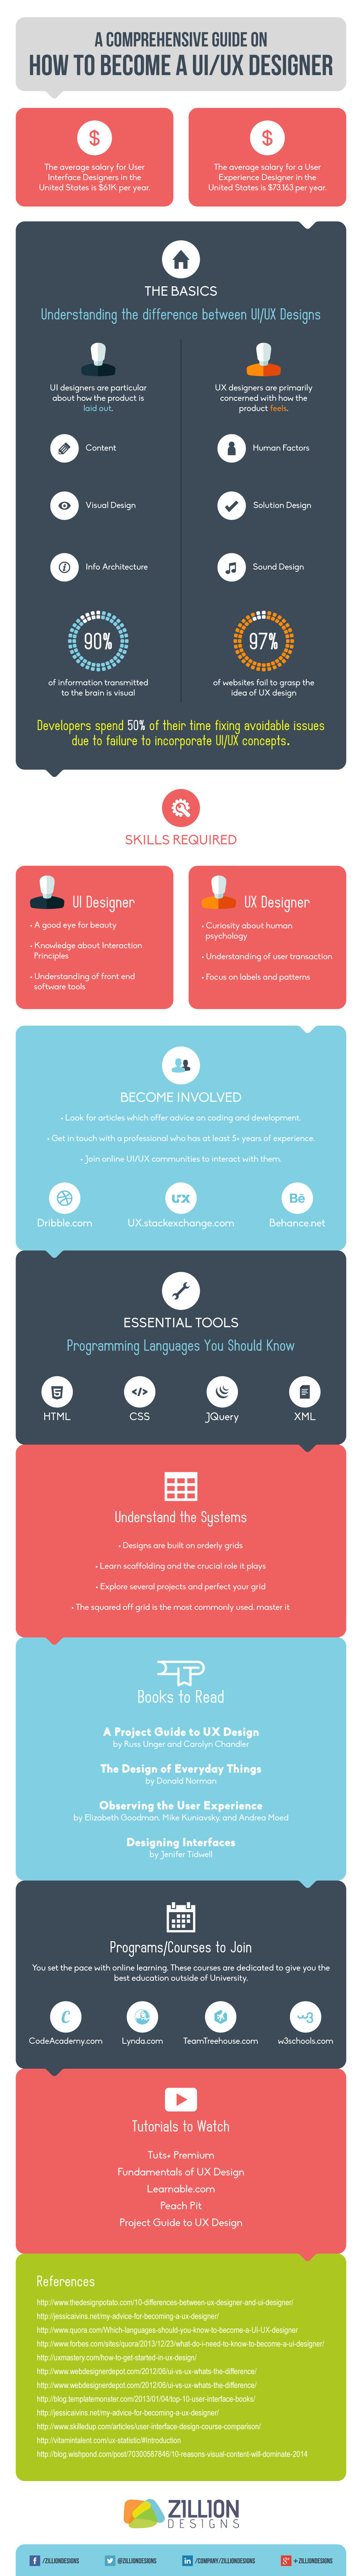 how-to-become-ui-ux-designer